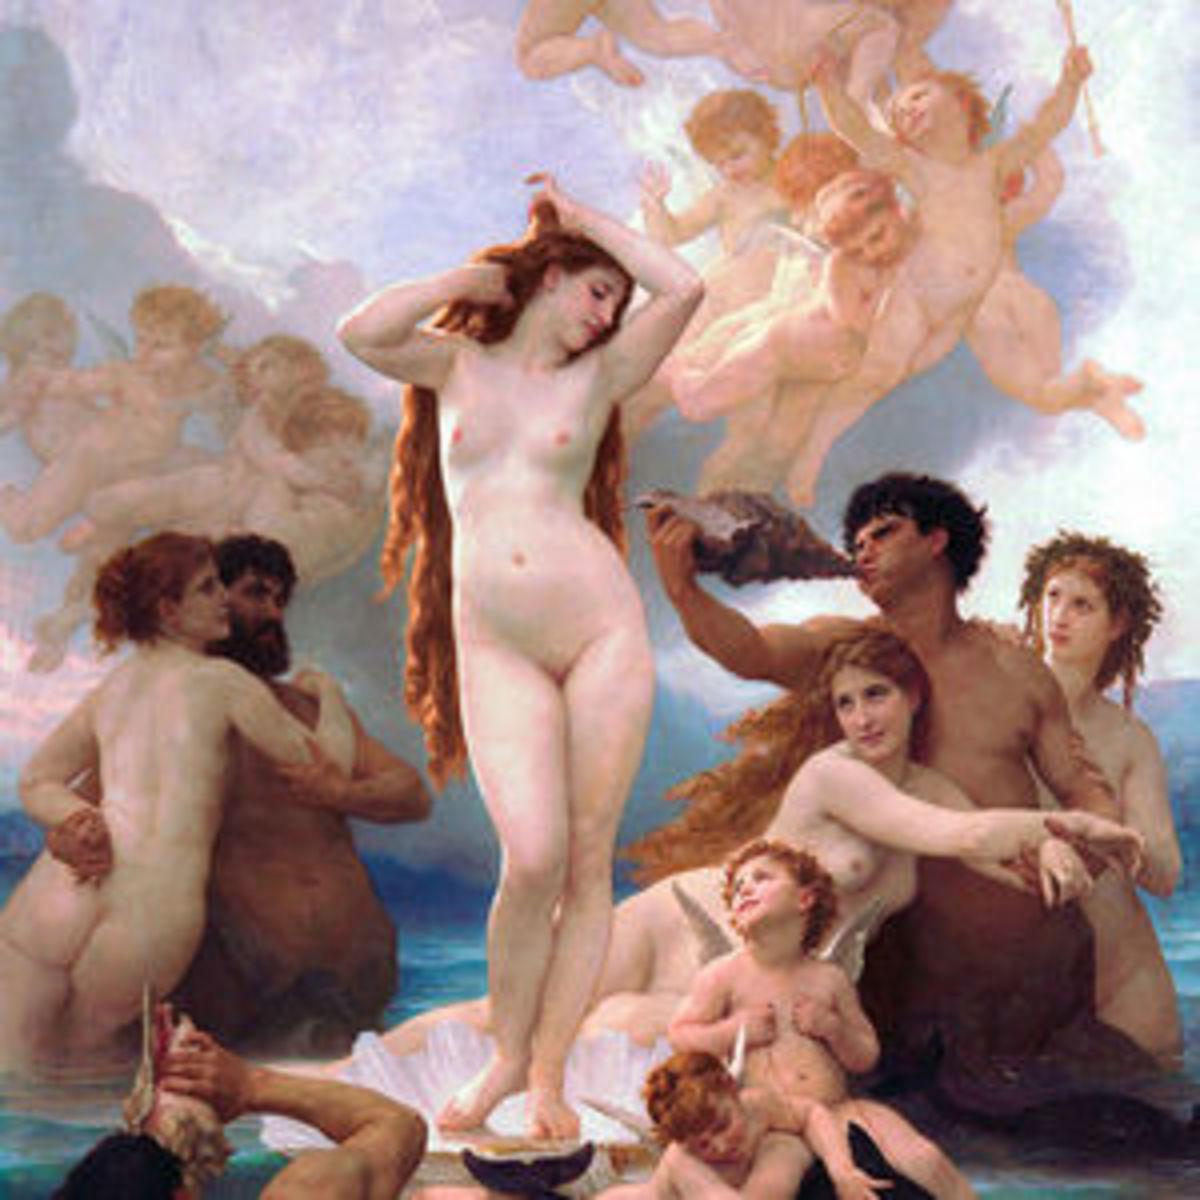 Venus the Roman Goddess of love and sex